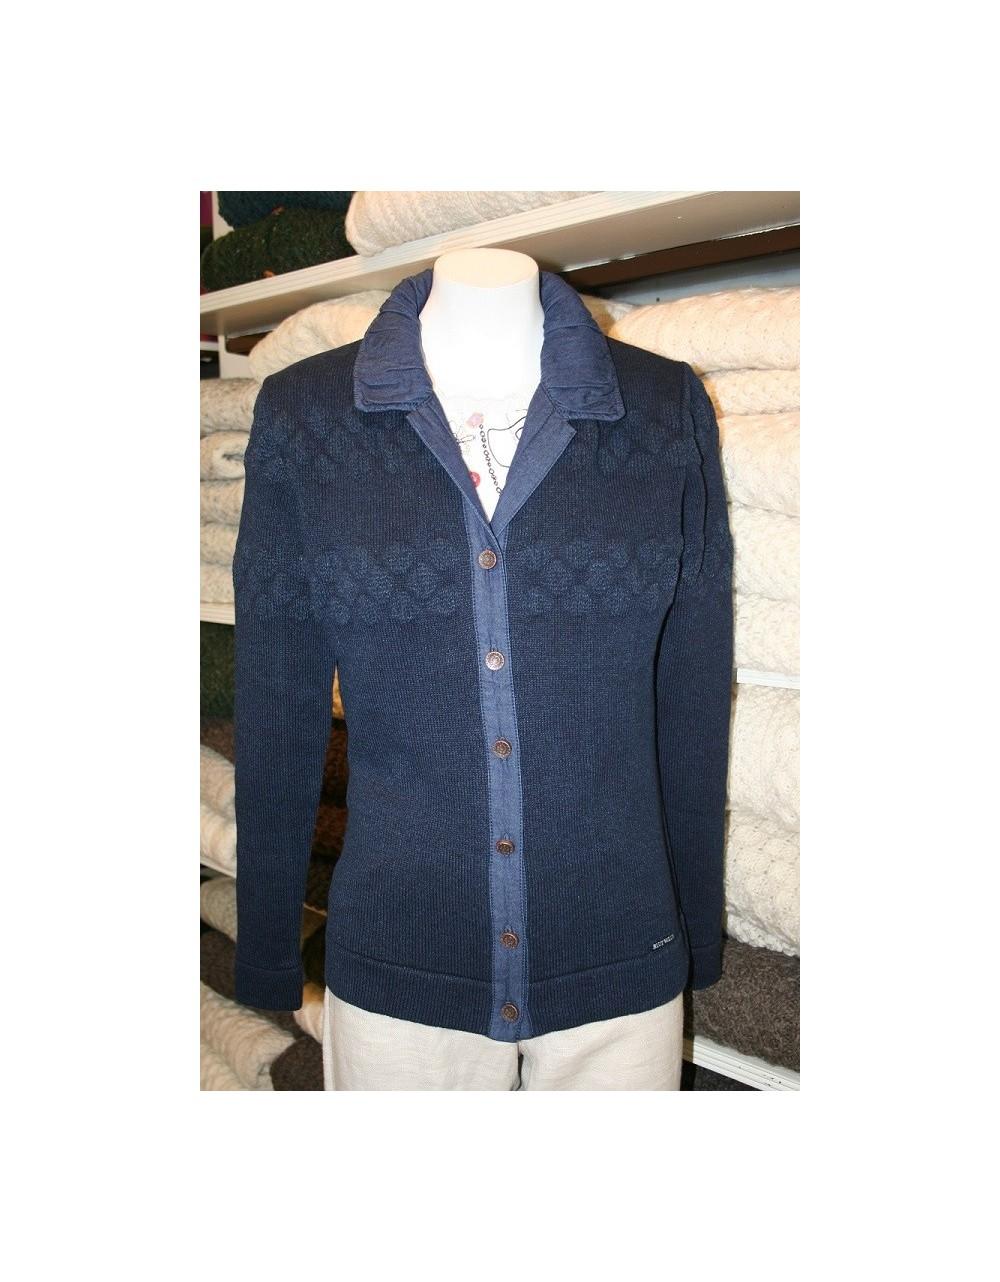 Blue Willi's Special Offer Classic Cardigan Danish Design Knitwear Irish Handcrafts -1